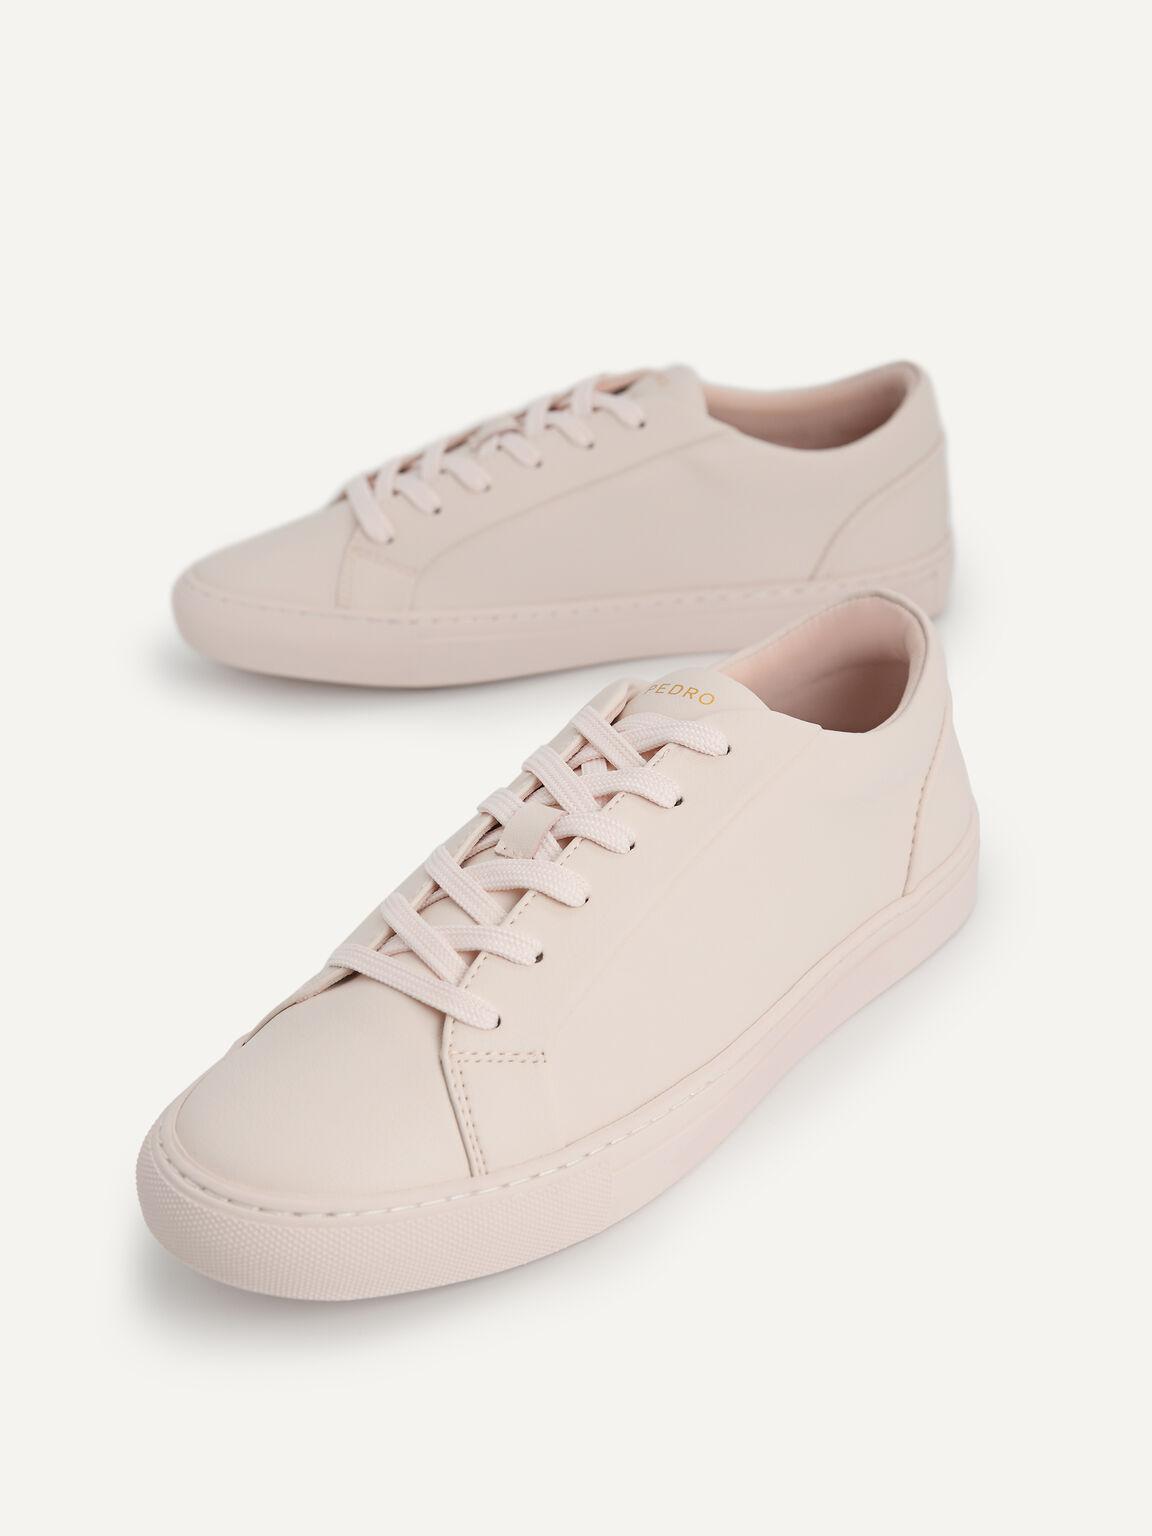 Atlas Lace-up Sneakers, Blush, hi-res